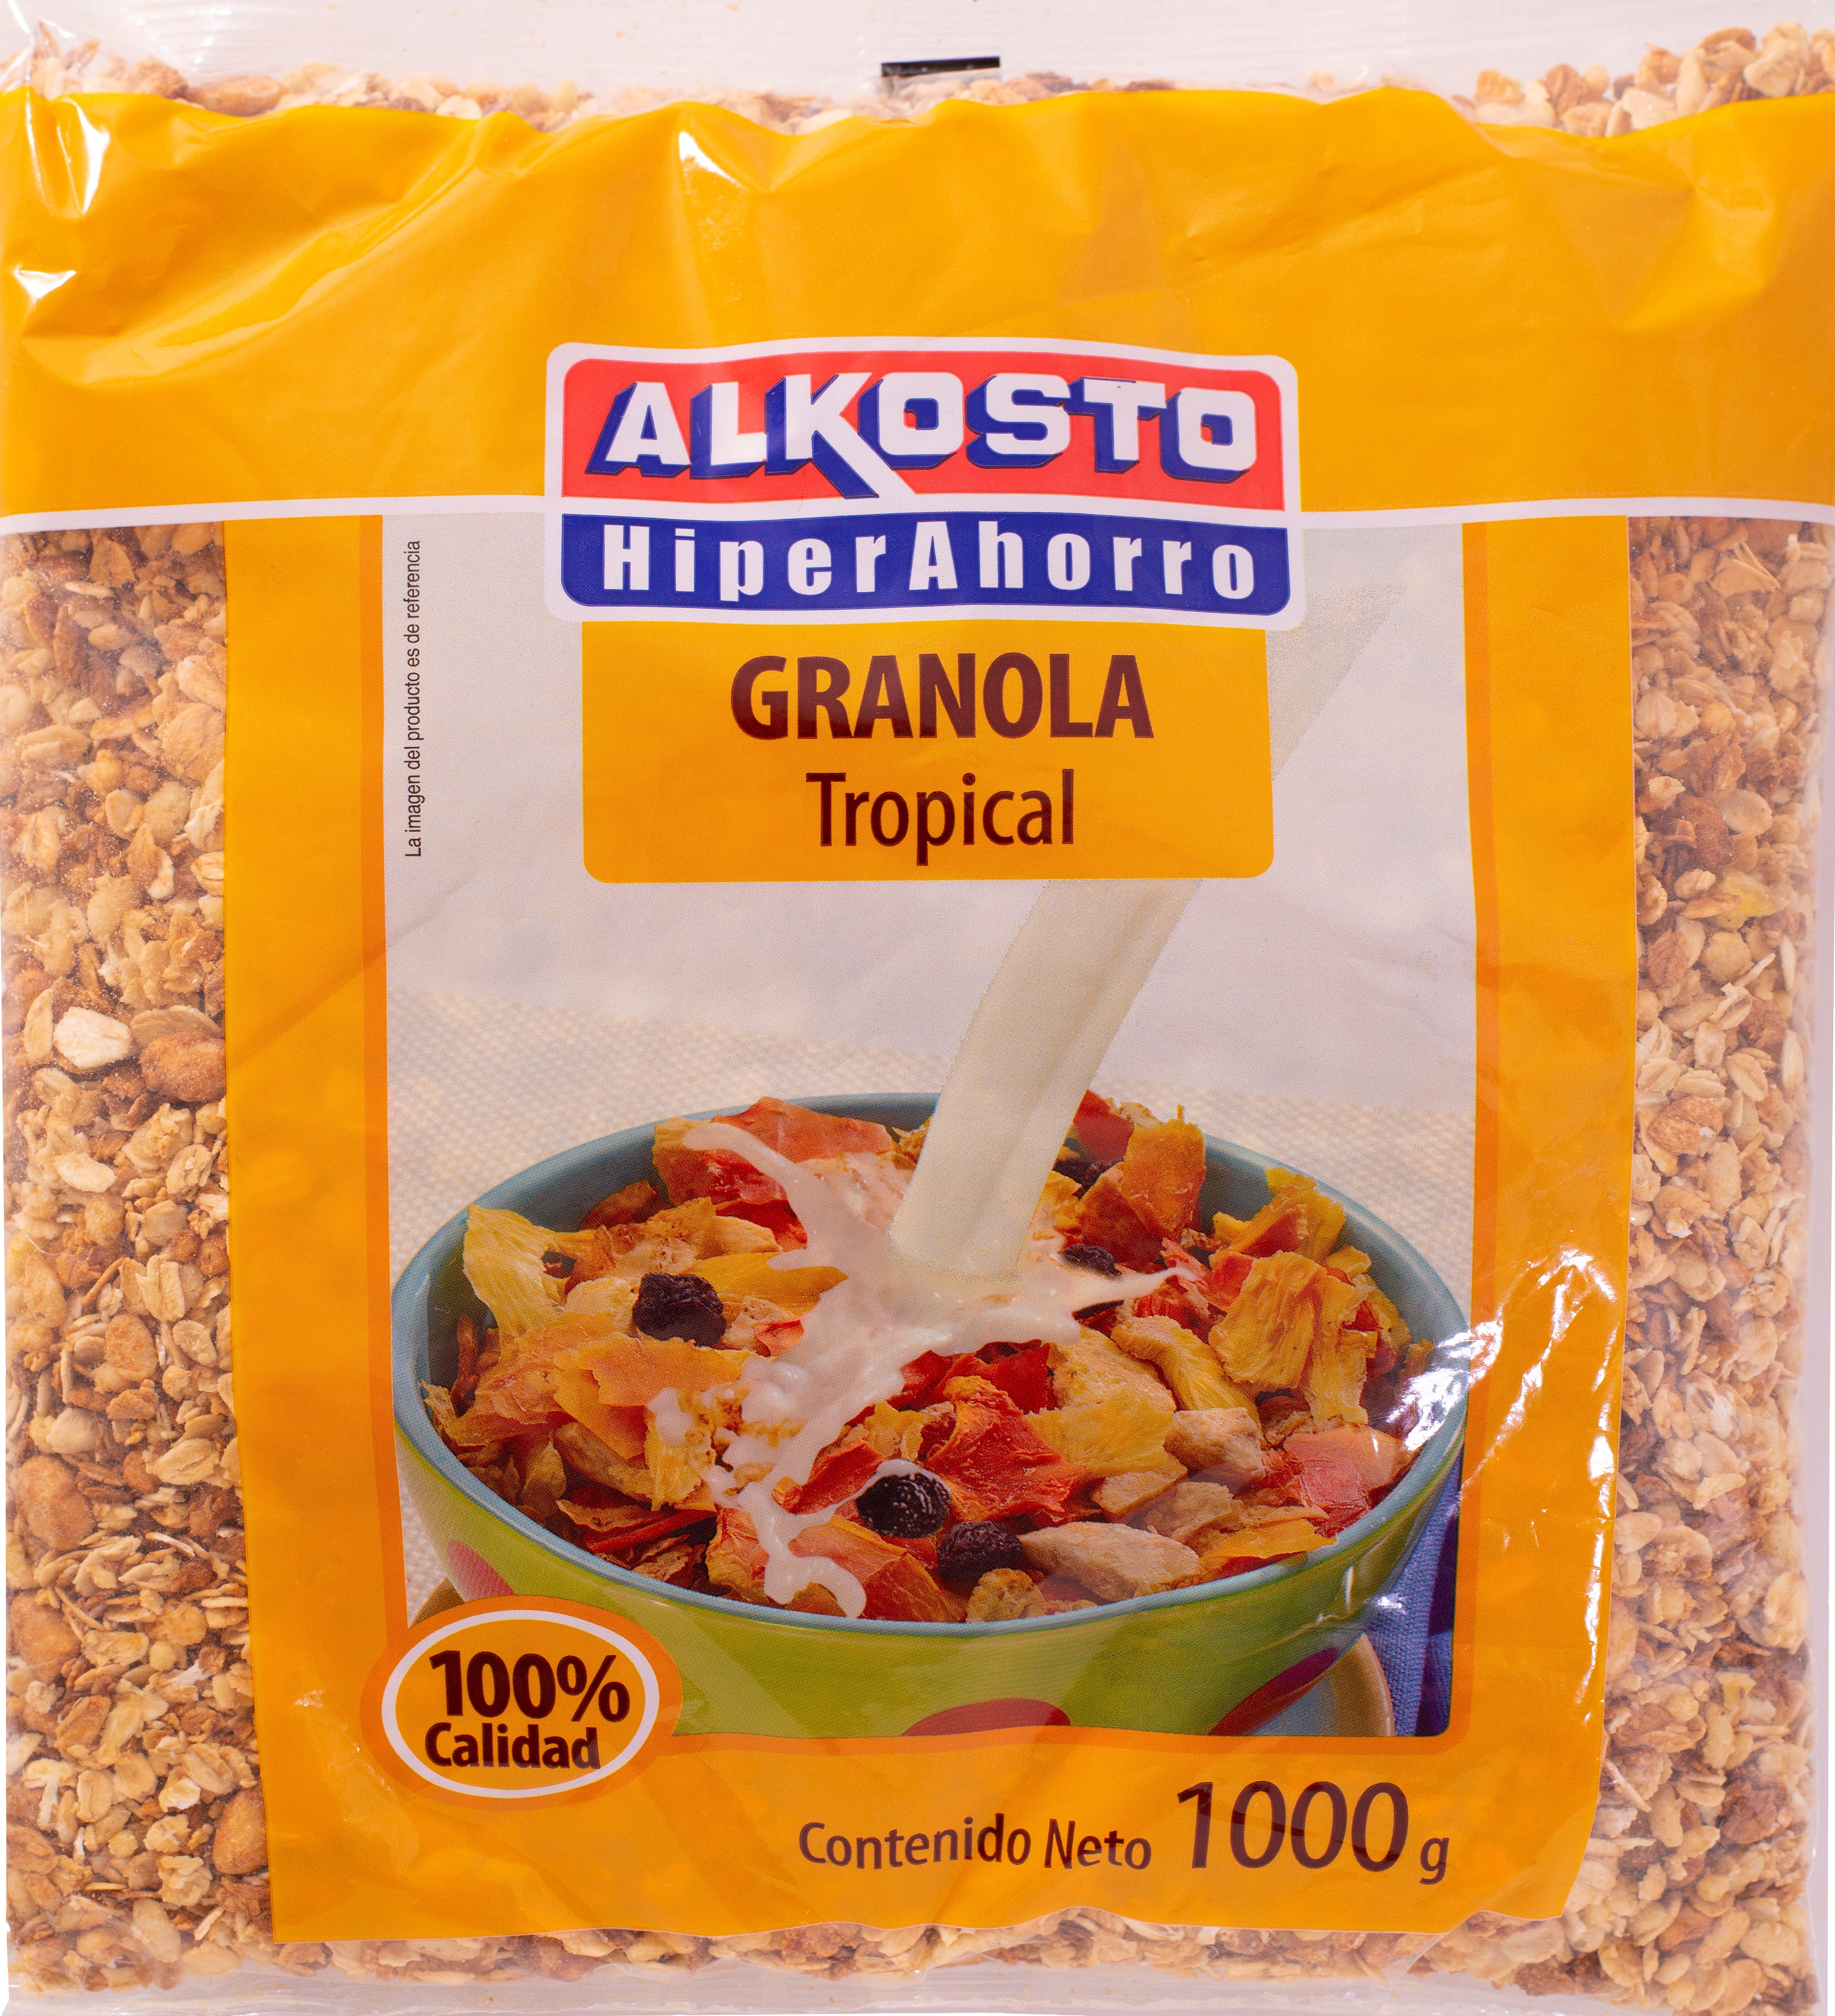 Granola Alkosto Tropical 1k